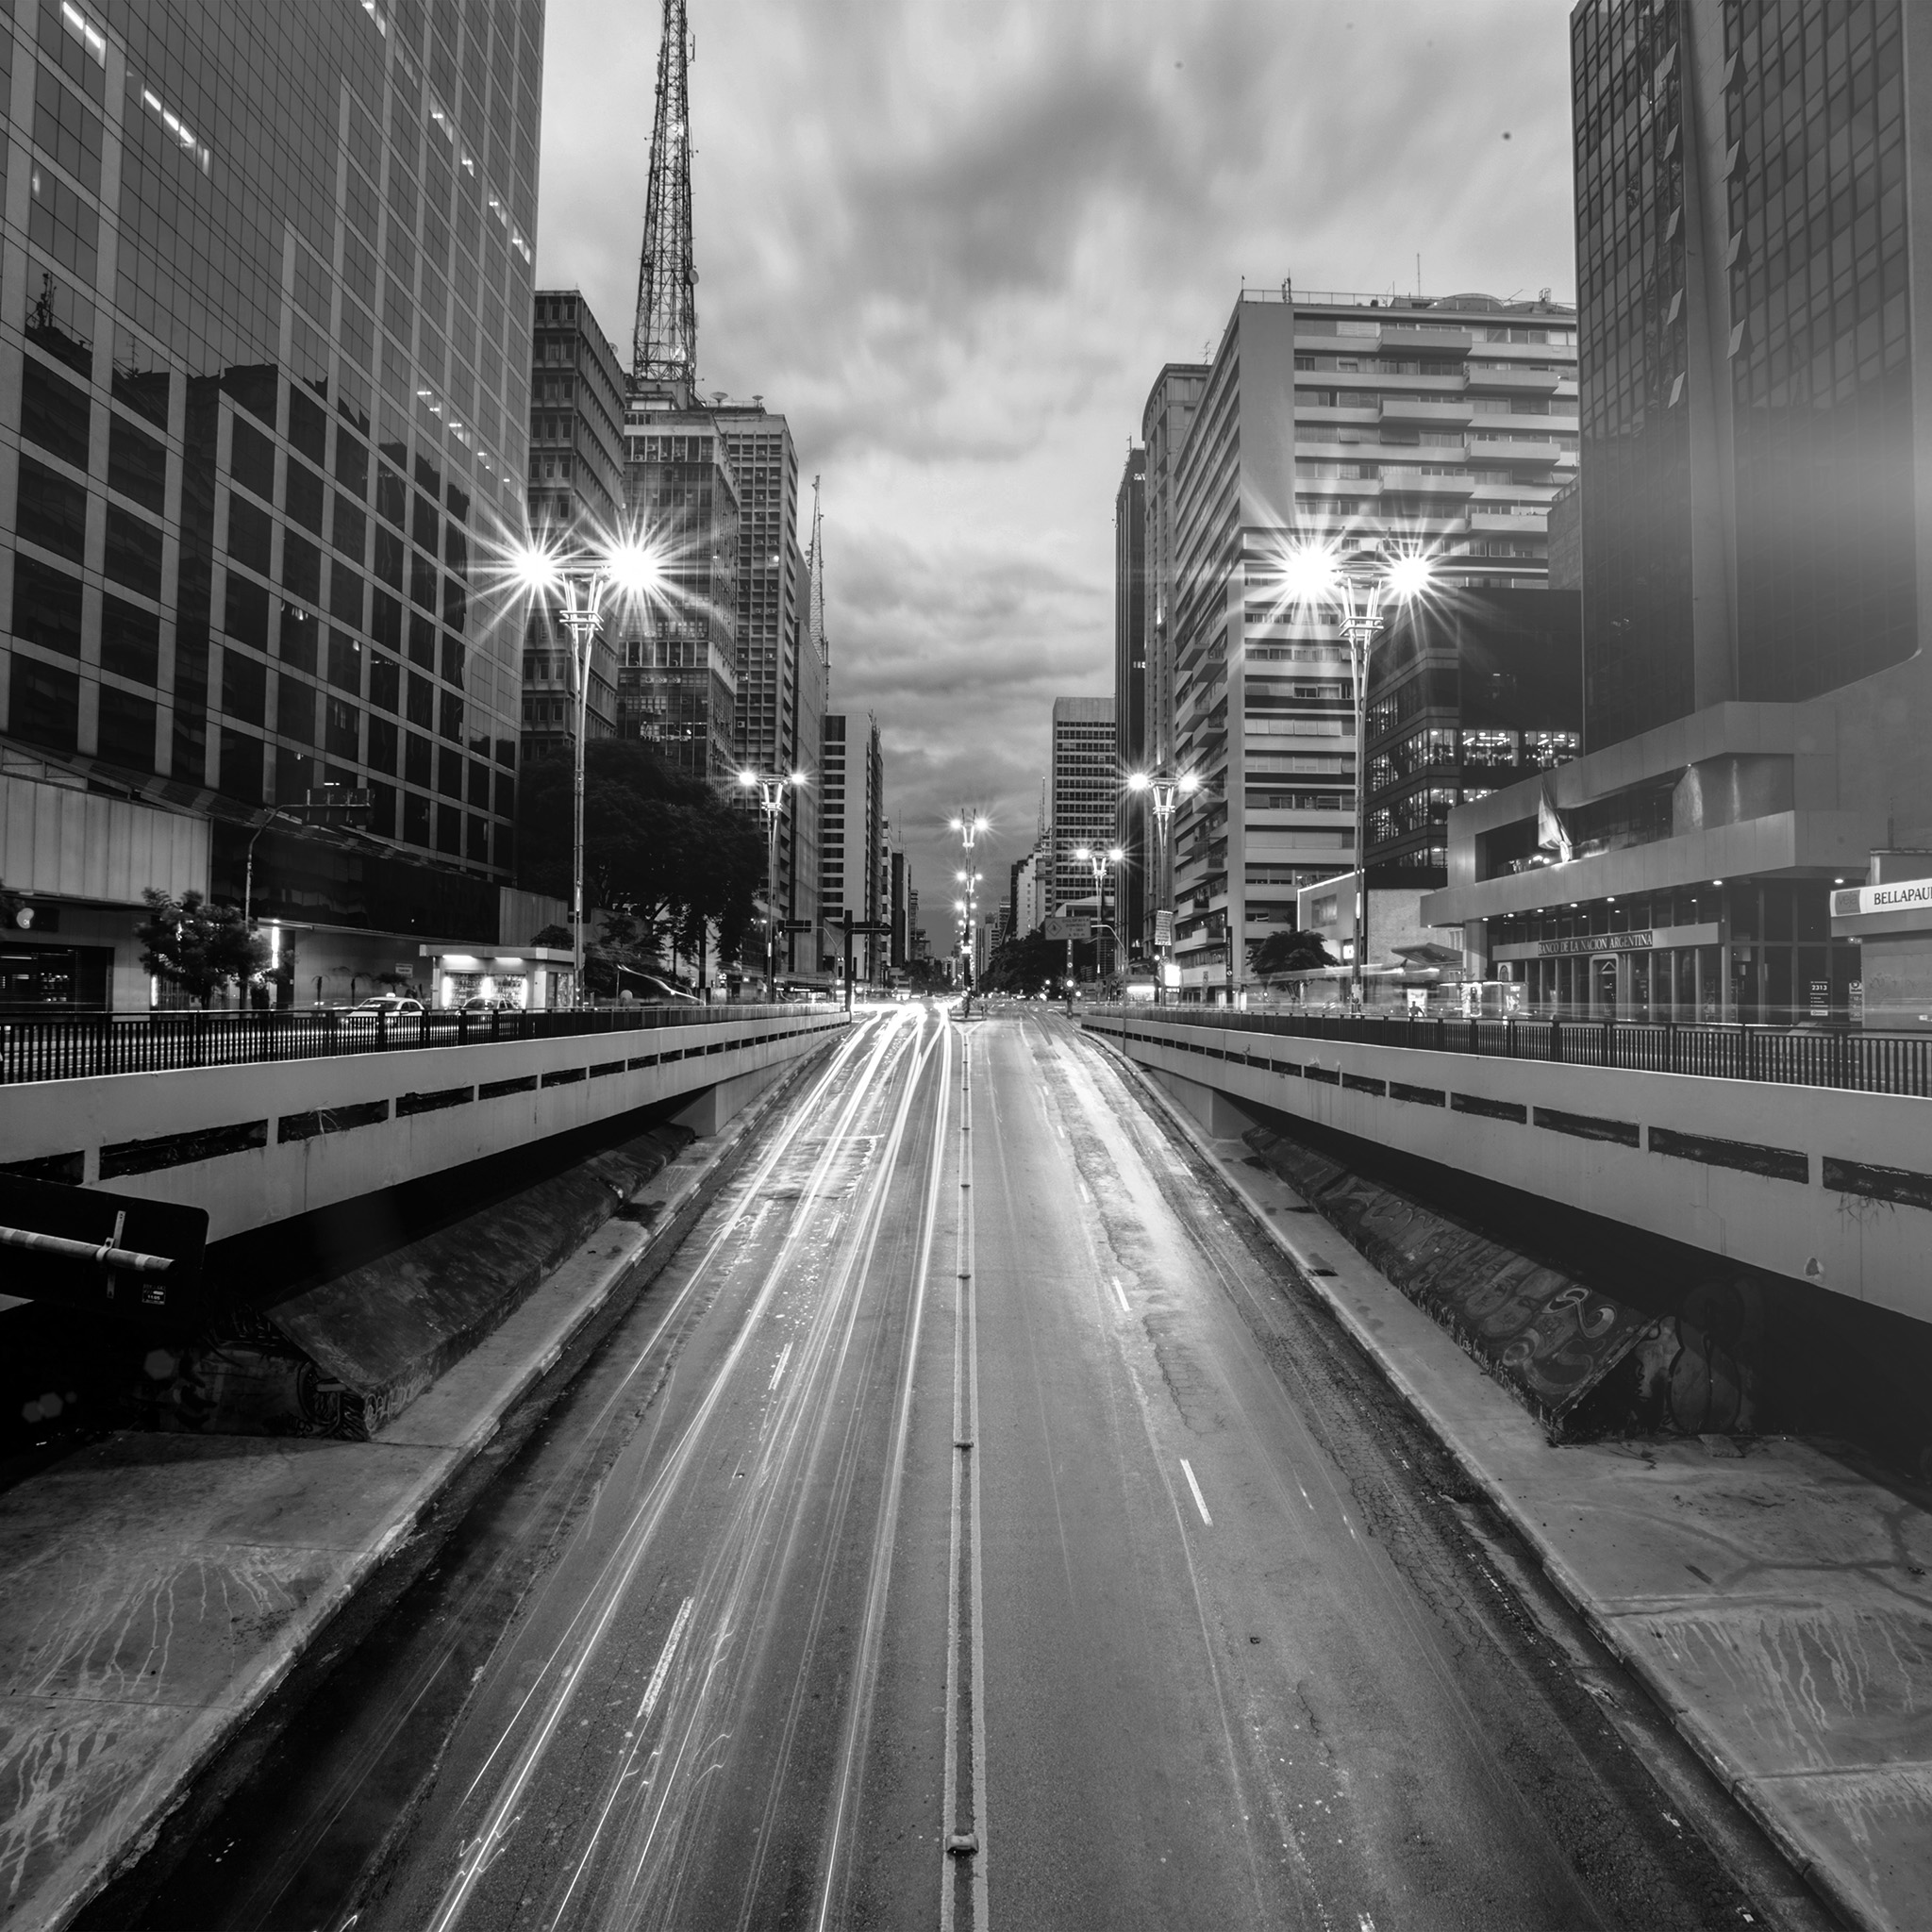 nd21-city-street-light-bw-night-car-wallpaper